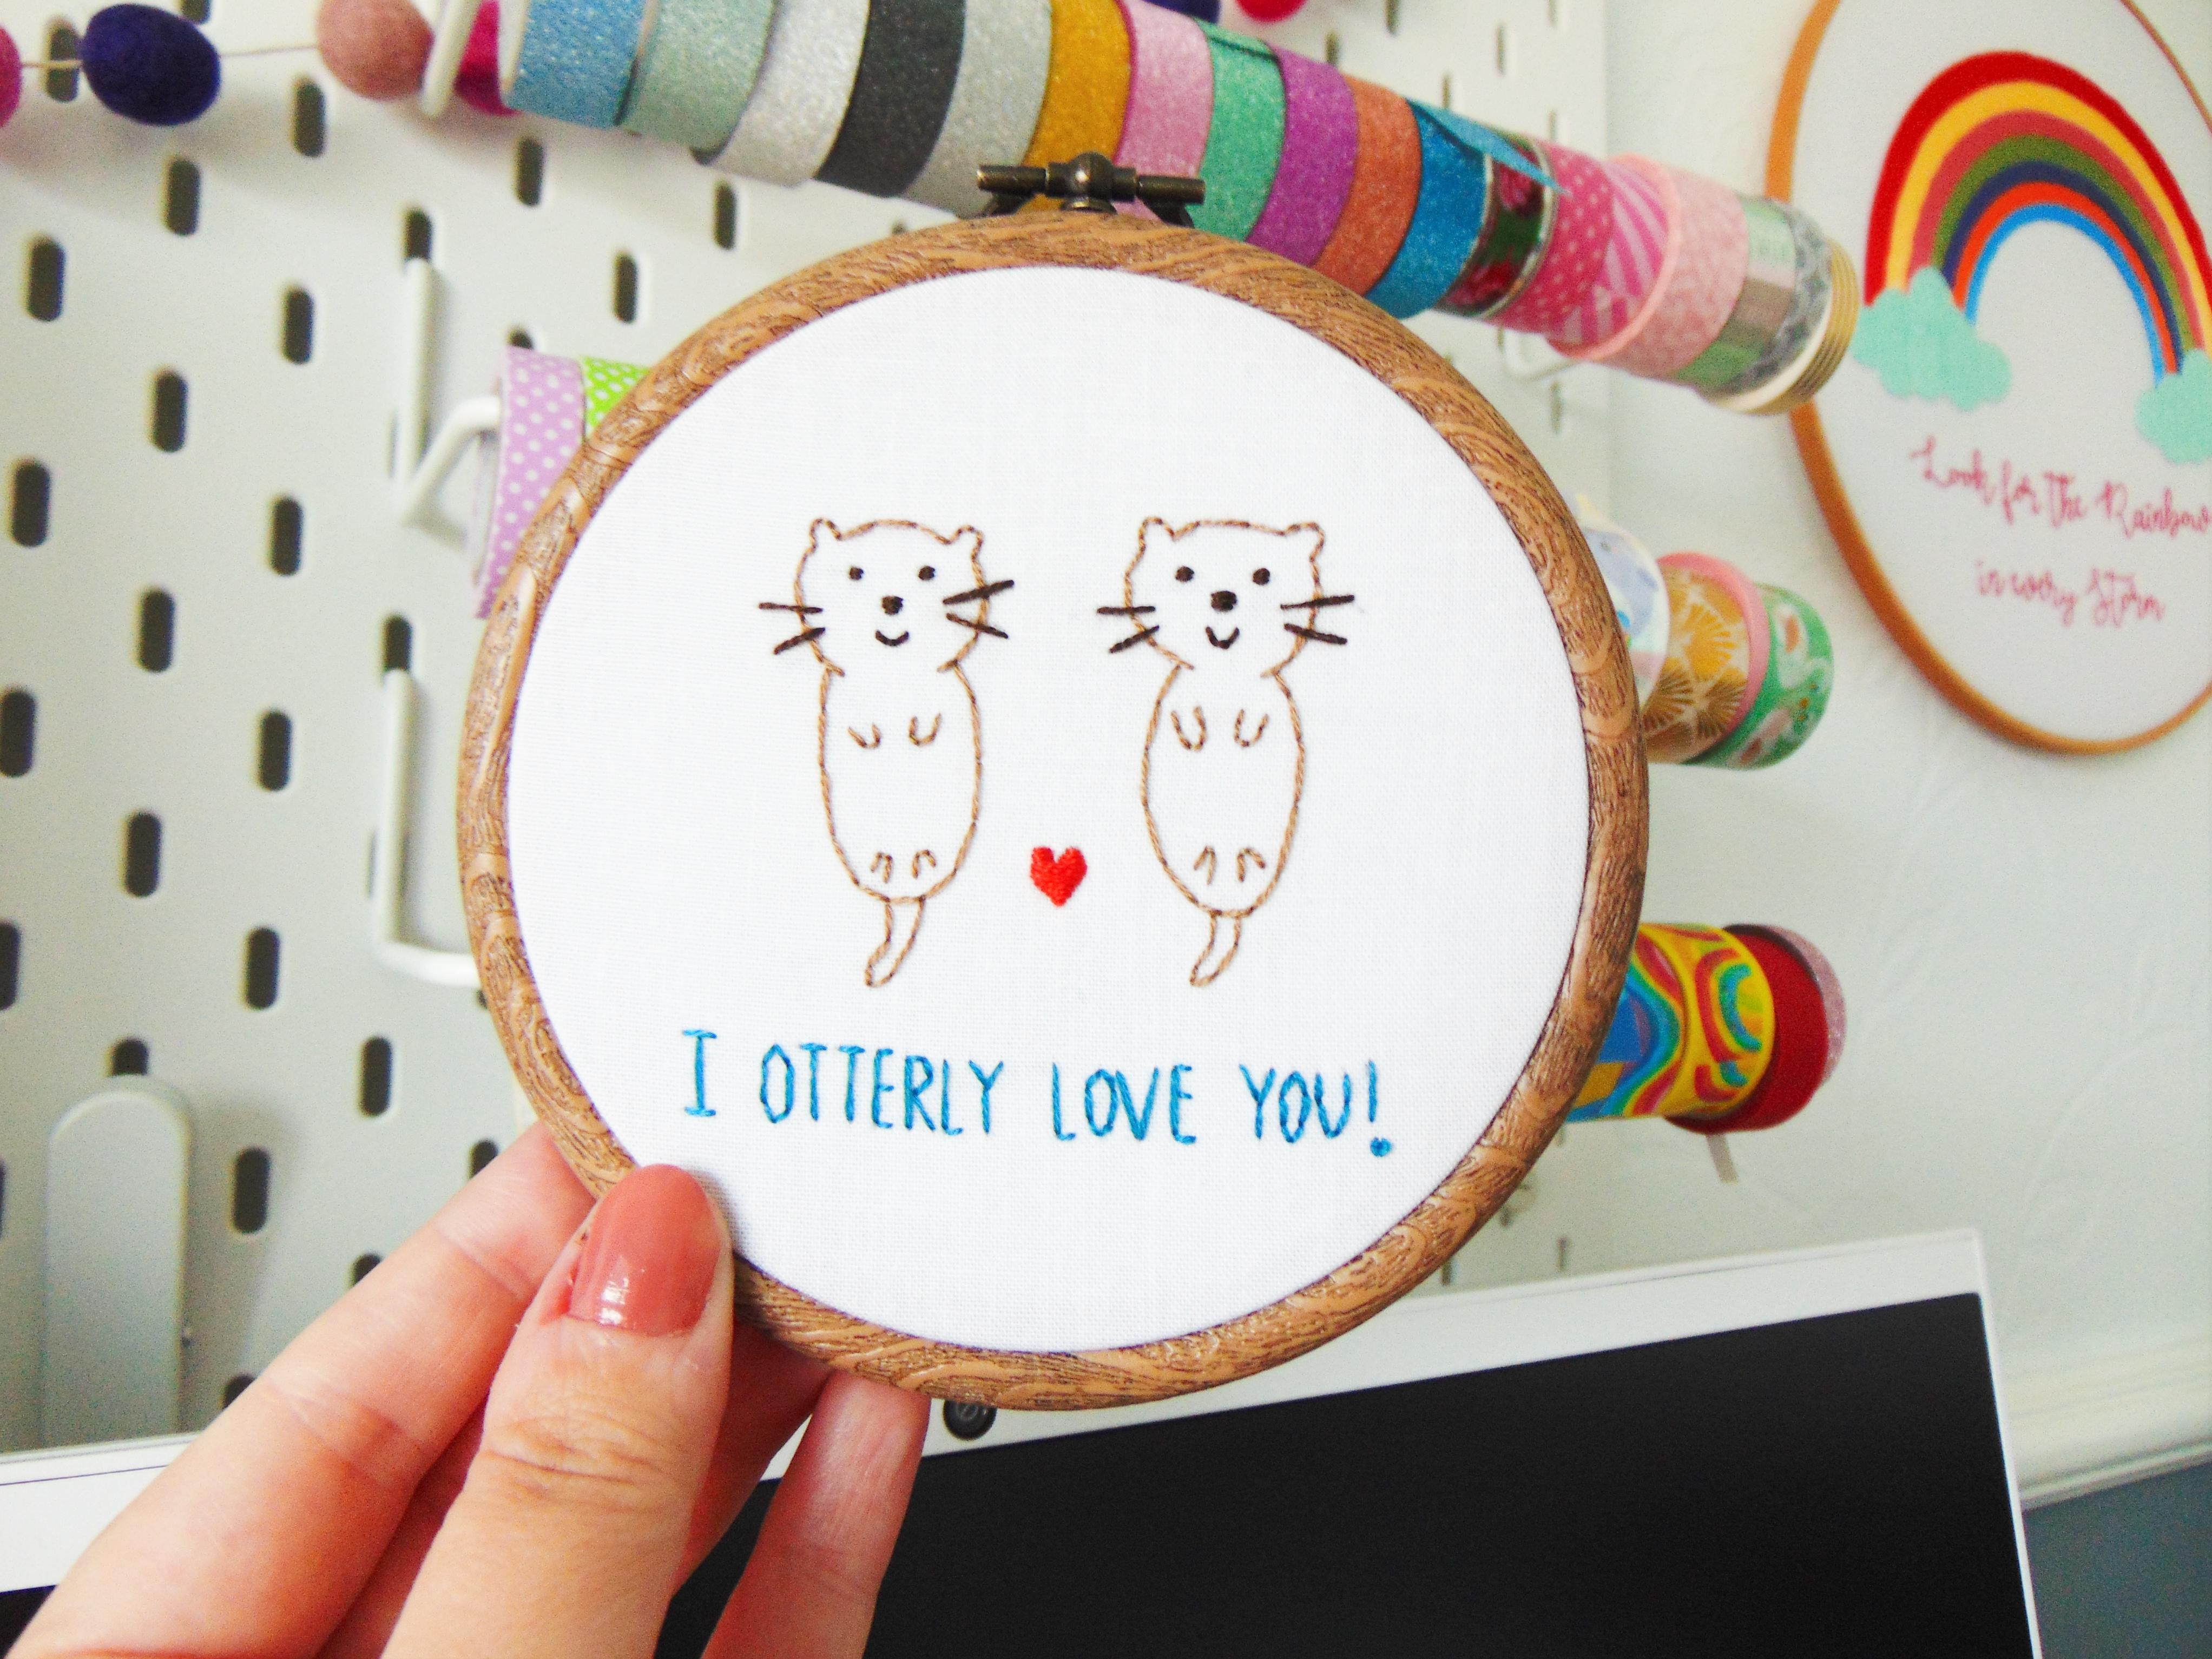 I Otterly Love You 6